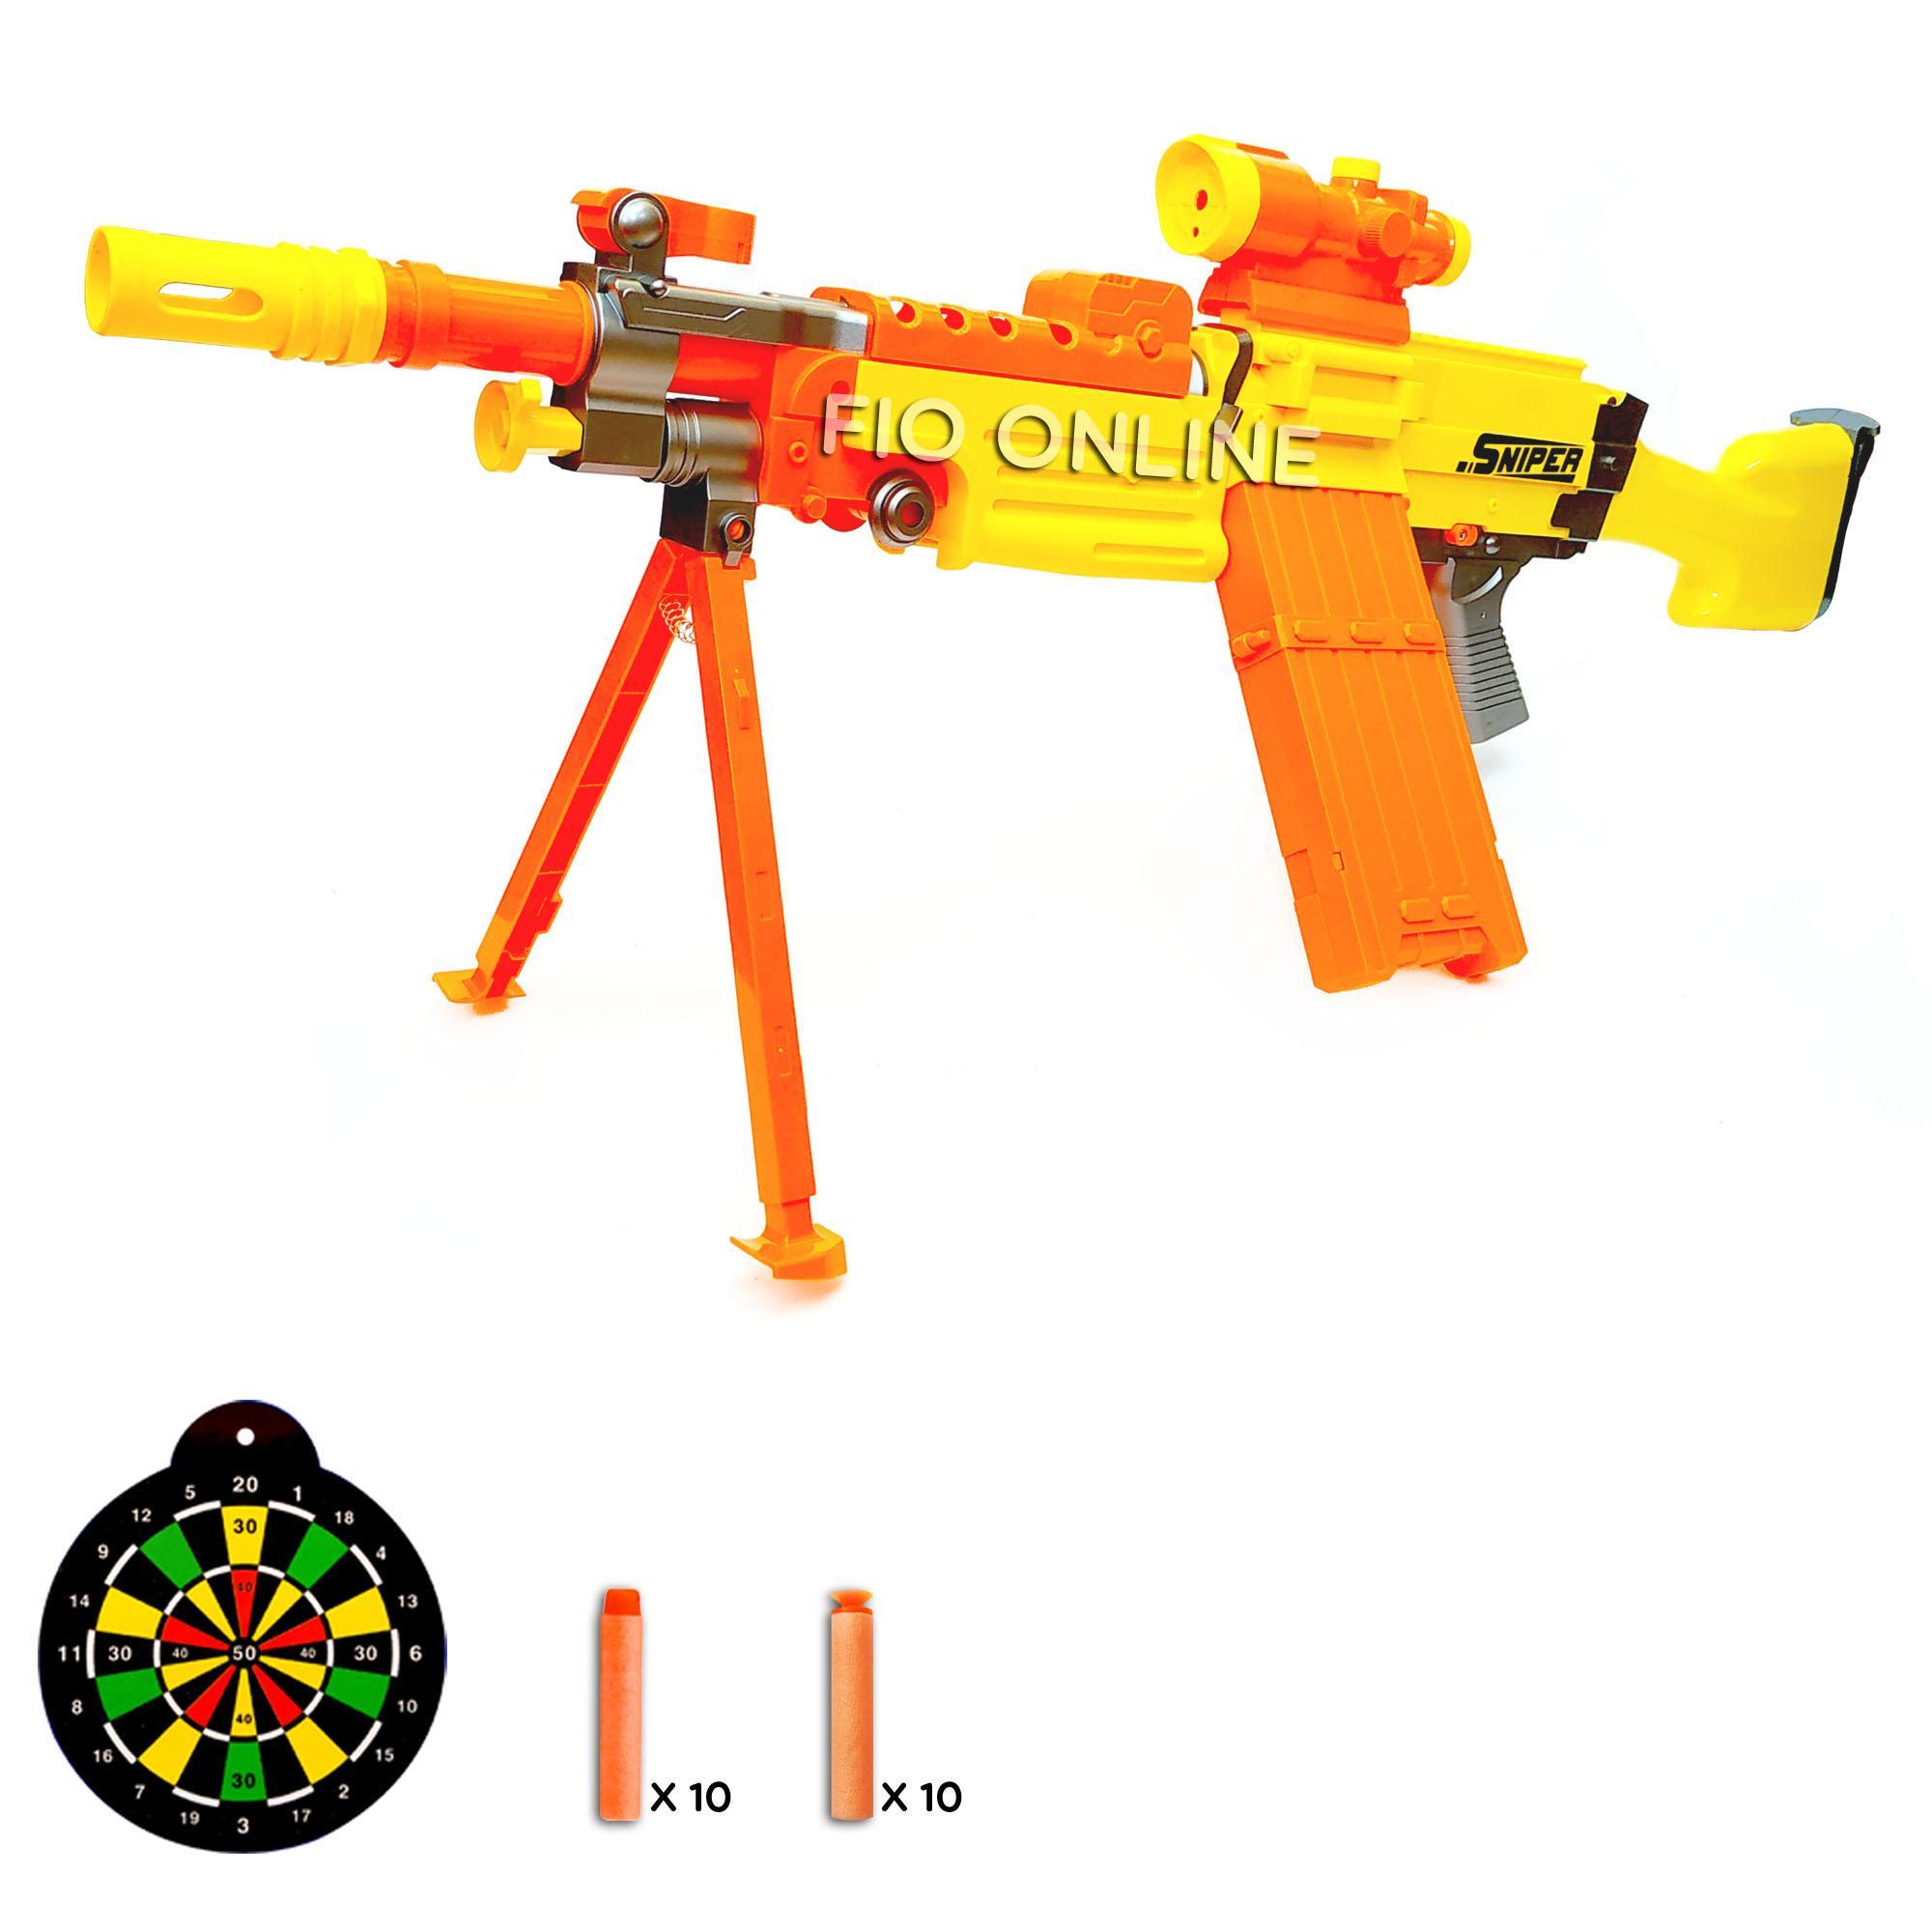 Fio Online - 7004B/7003B Sniper Soft Bullet Gun - Mainan Anak Senjatan Laras Panjang